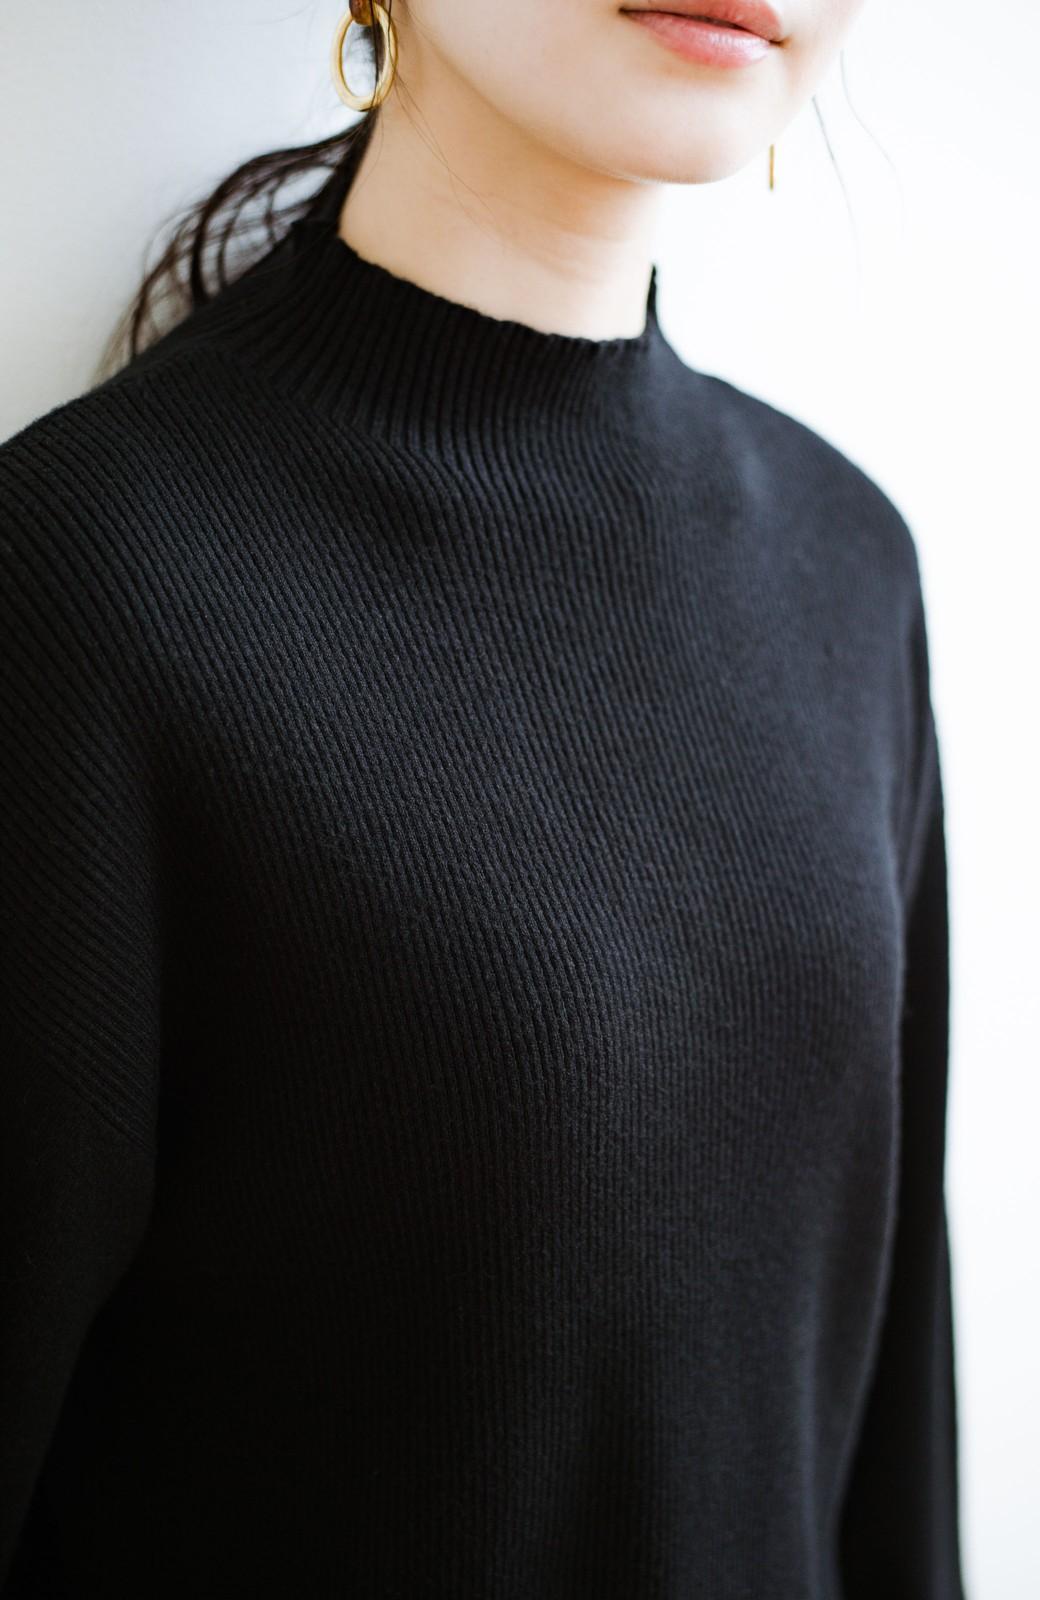 haco! 気になるところをそっと隠してくれる便利なリブニット <ブラック>の商品写真3